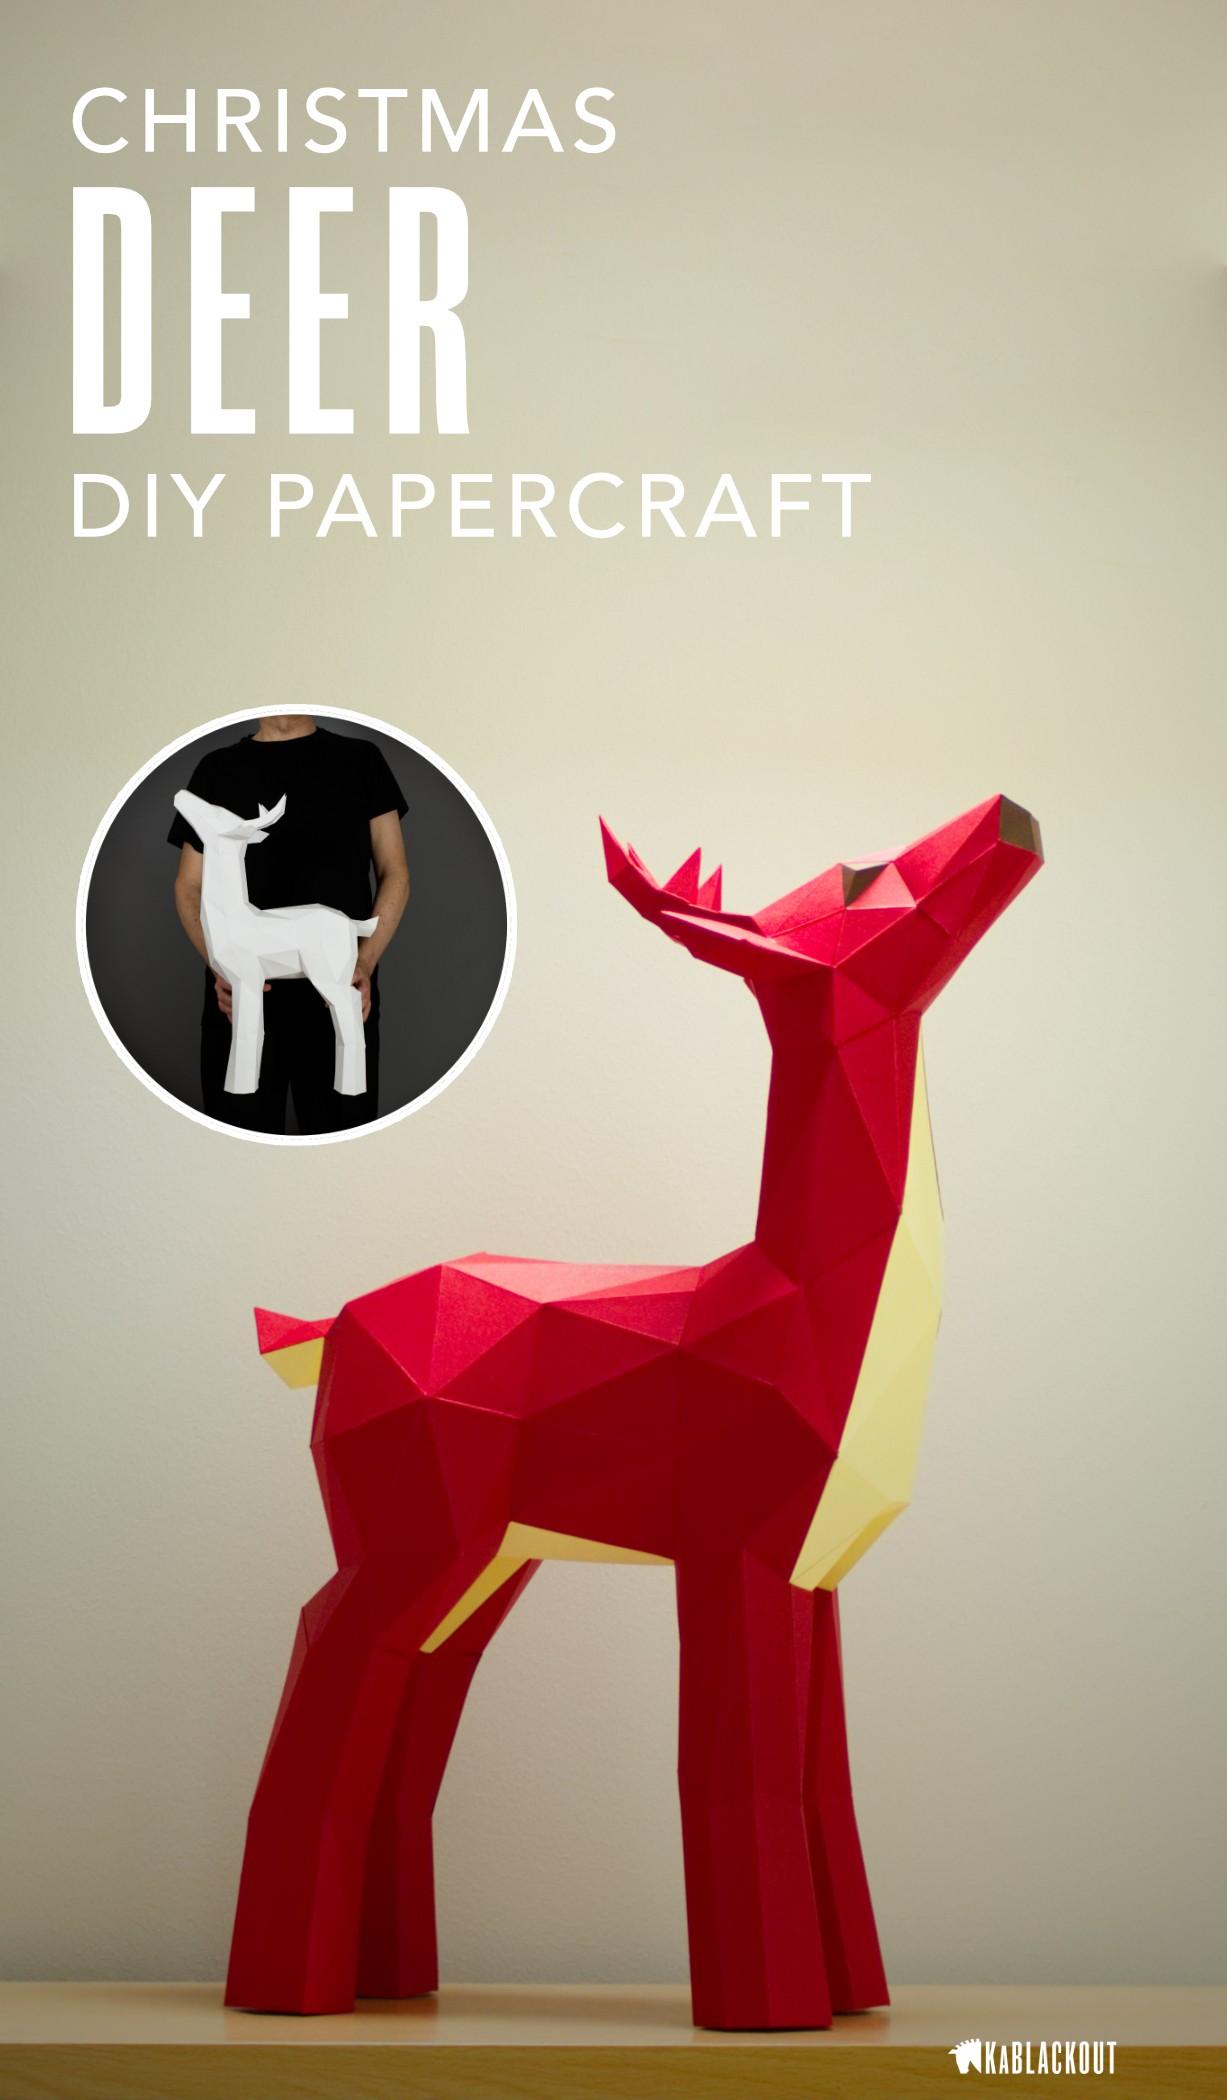 Papercraft for Beginners Deer Papercraft Papercraft Deer Diy Deer Low Poly Deer Deer